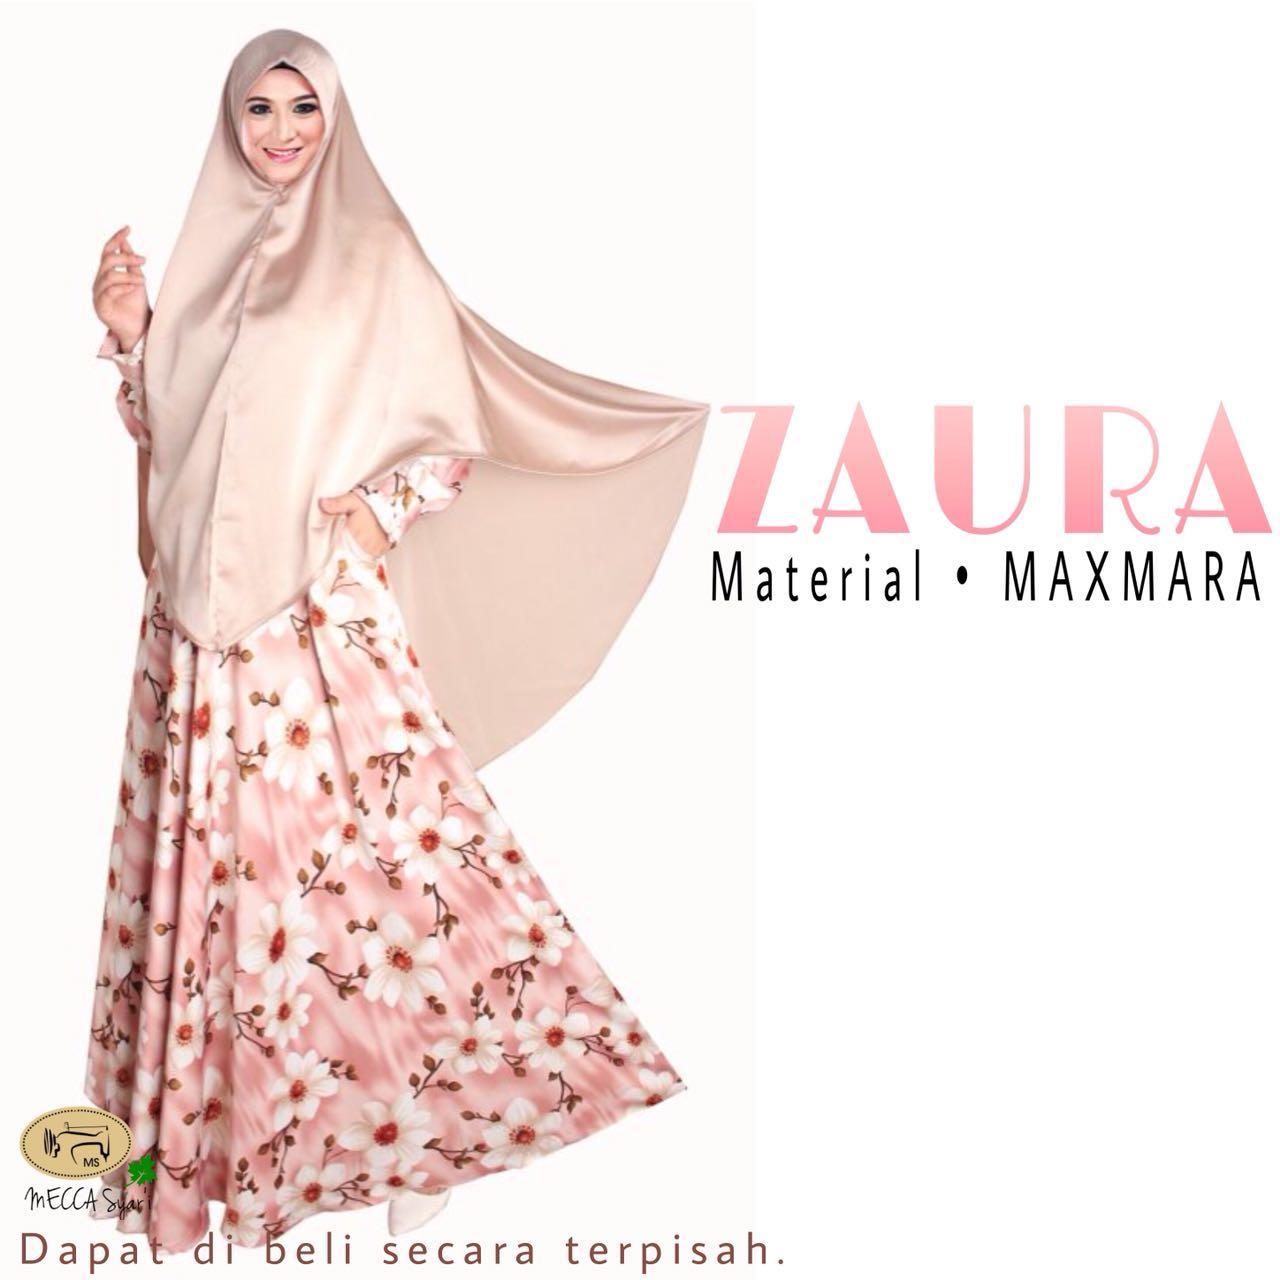 baju wanita terbaru syari muslimah bahan bagus jahitan rapi harga murah